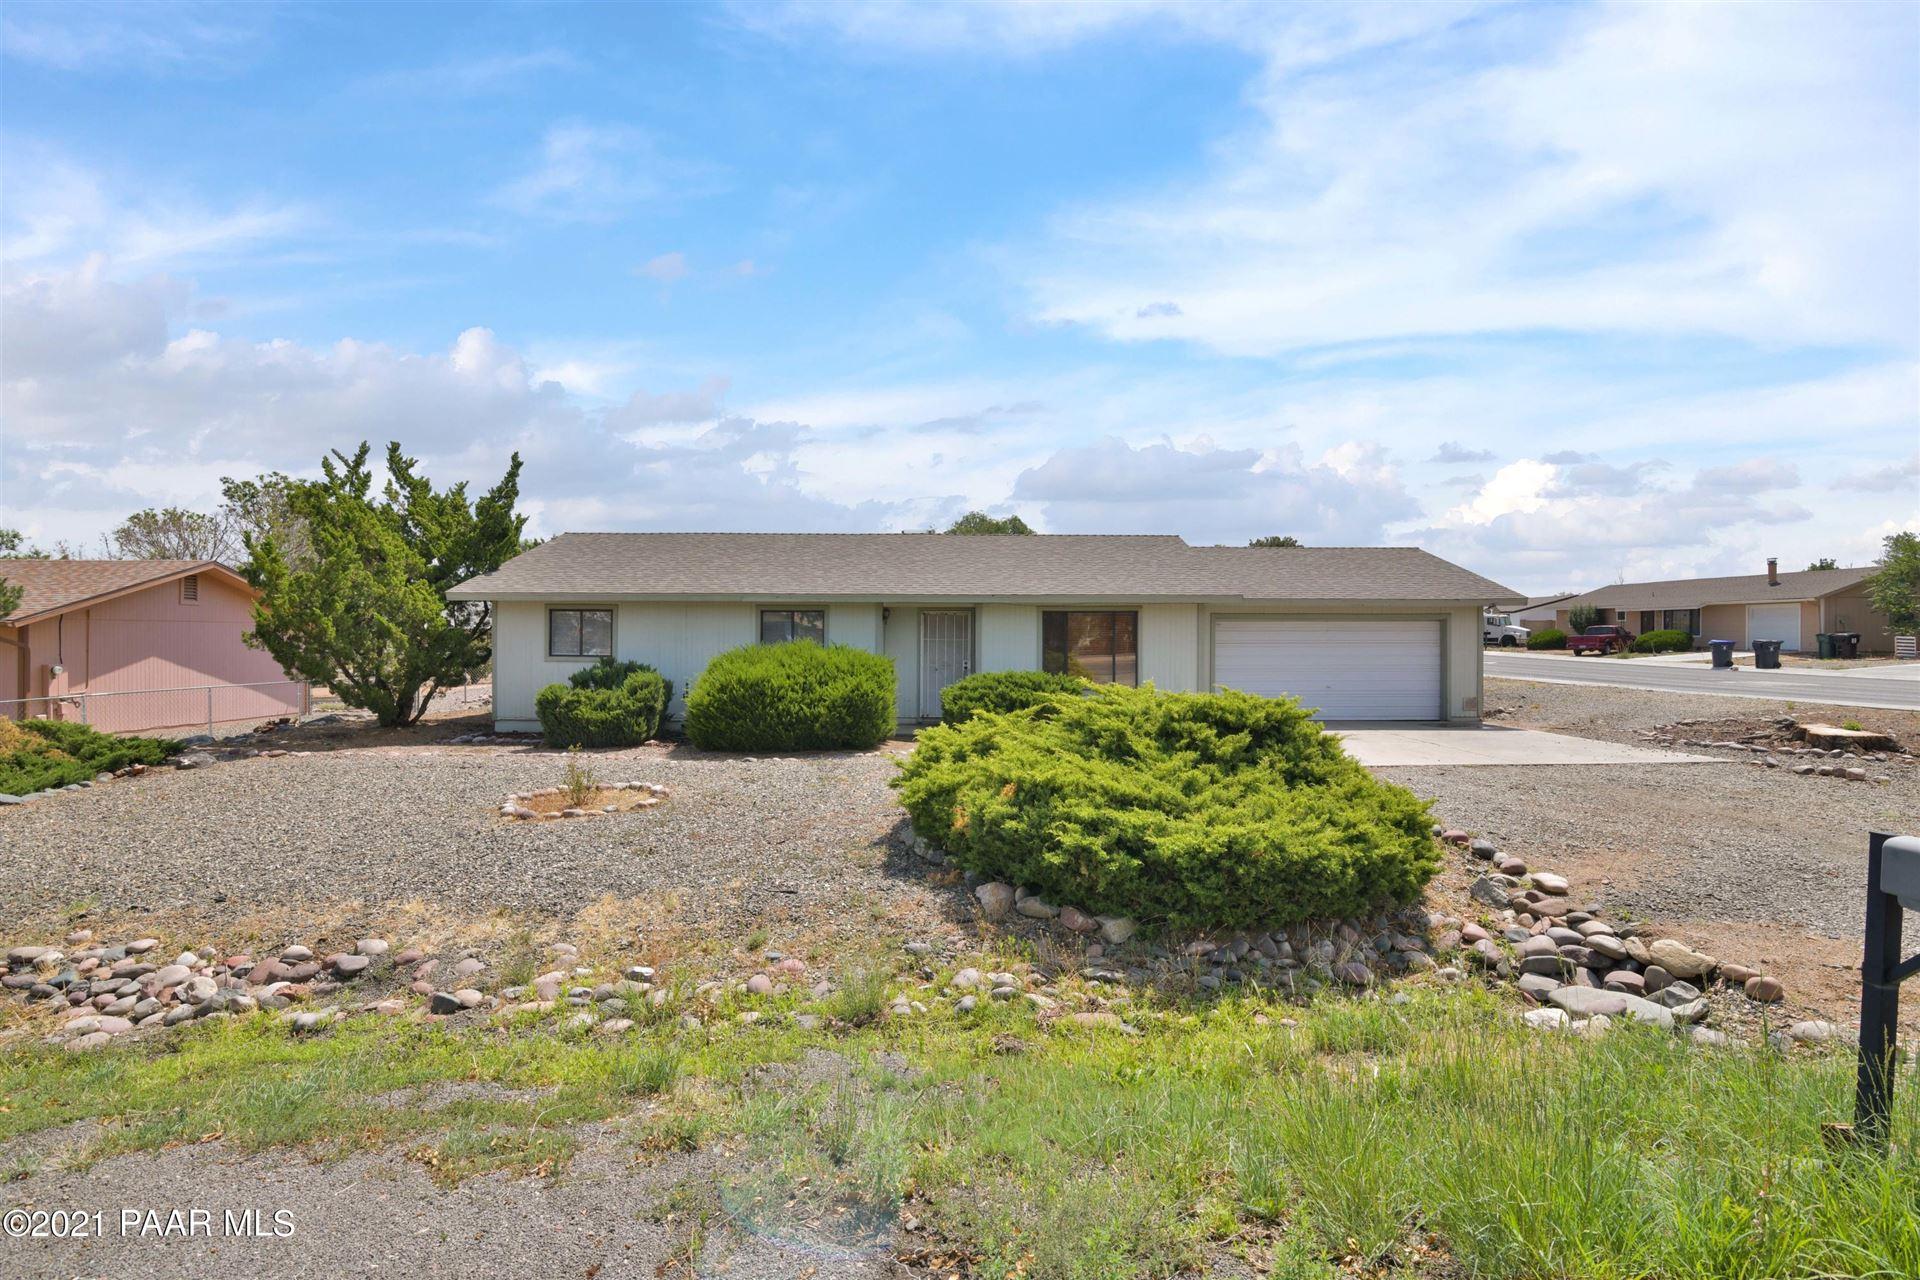 Photo of 3201 N Prescott East Highway #Lot: 606, Prescott Valley, AZ 86314 (MLS # 1040504)